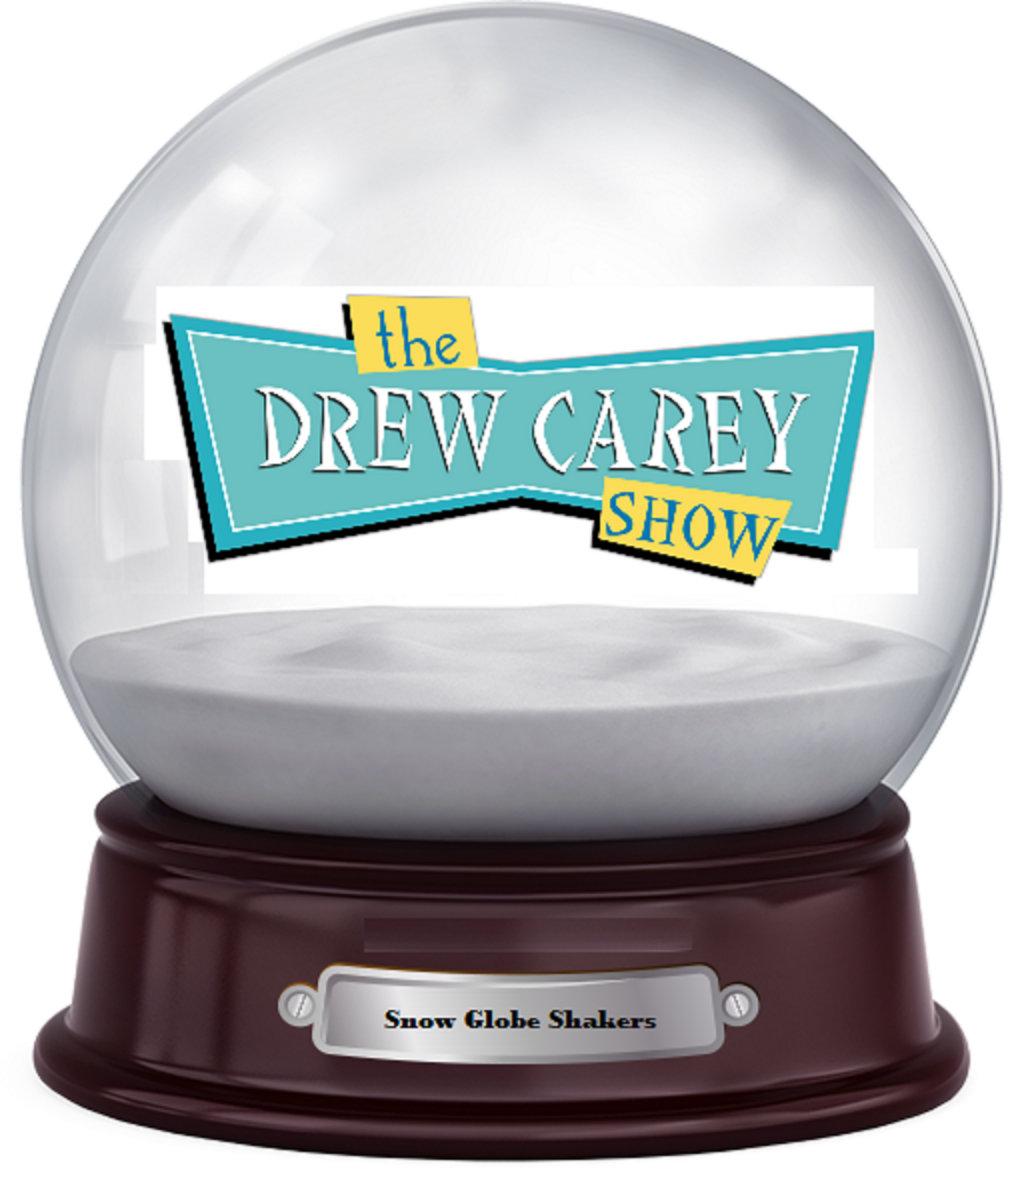 Freeze/Frame Episode 1: Snow Globe Shakers - The Drew Carey Show ...